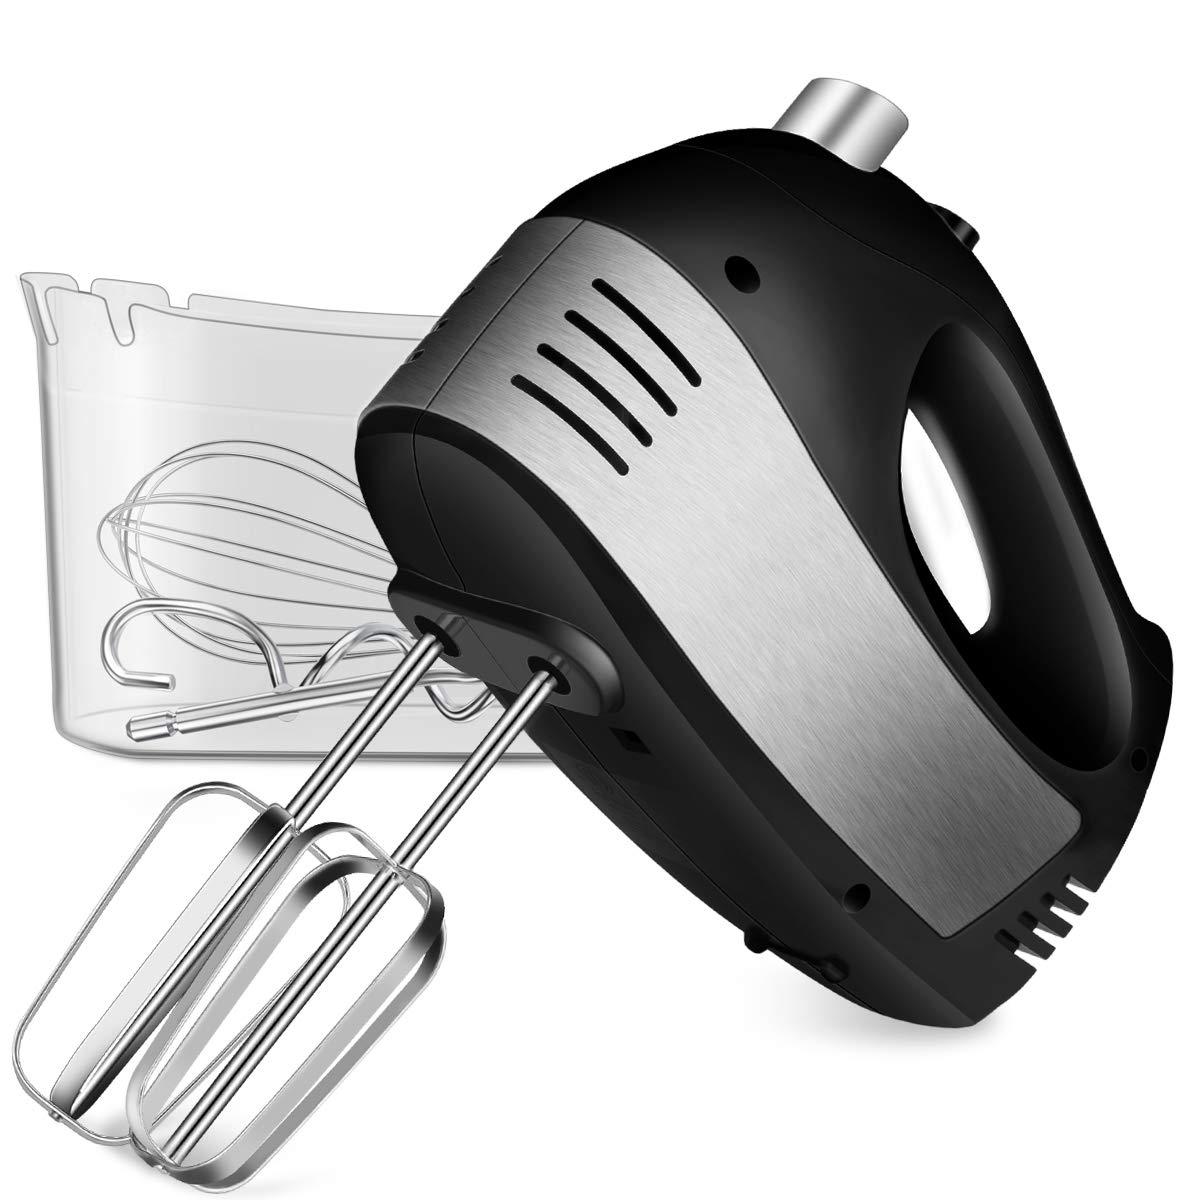 Hand Mixer (Black)